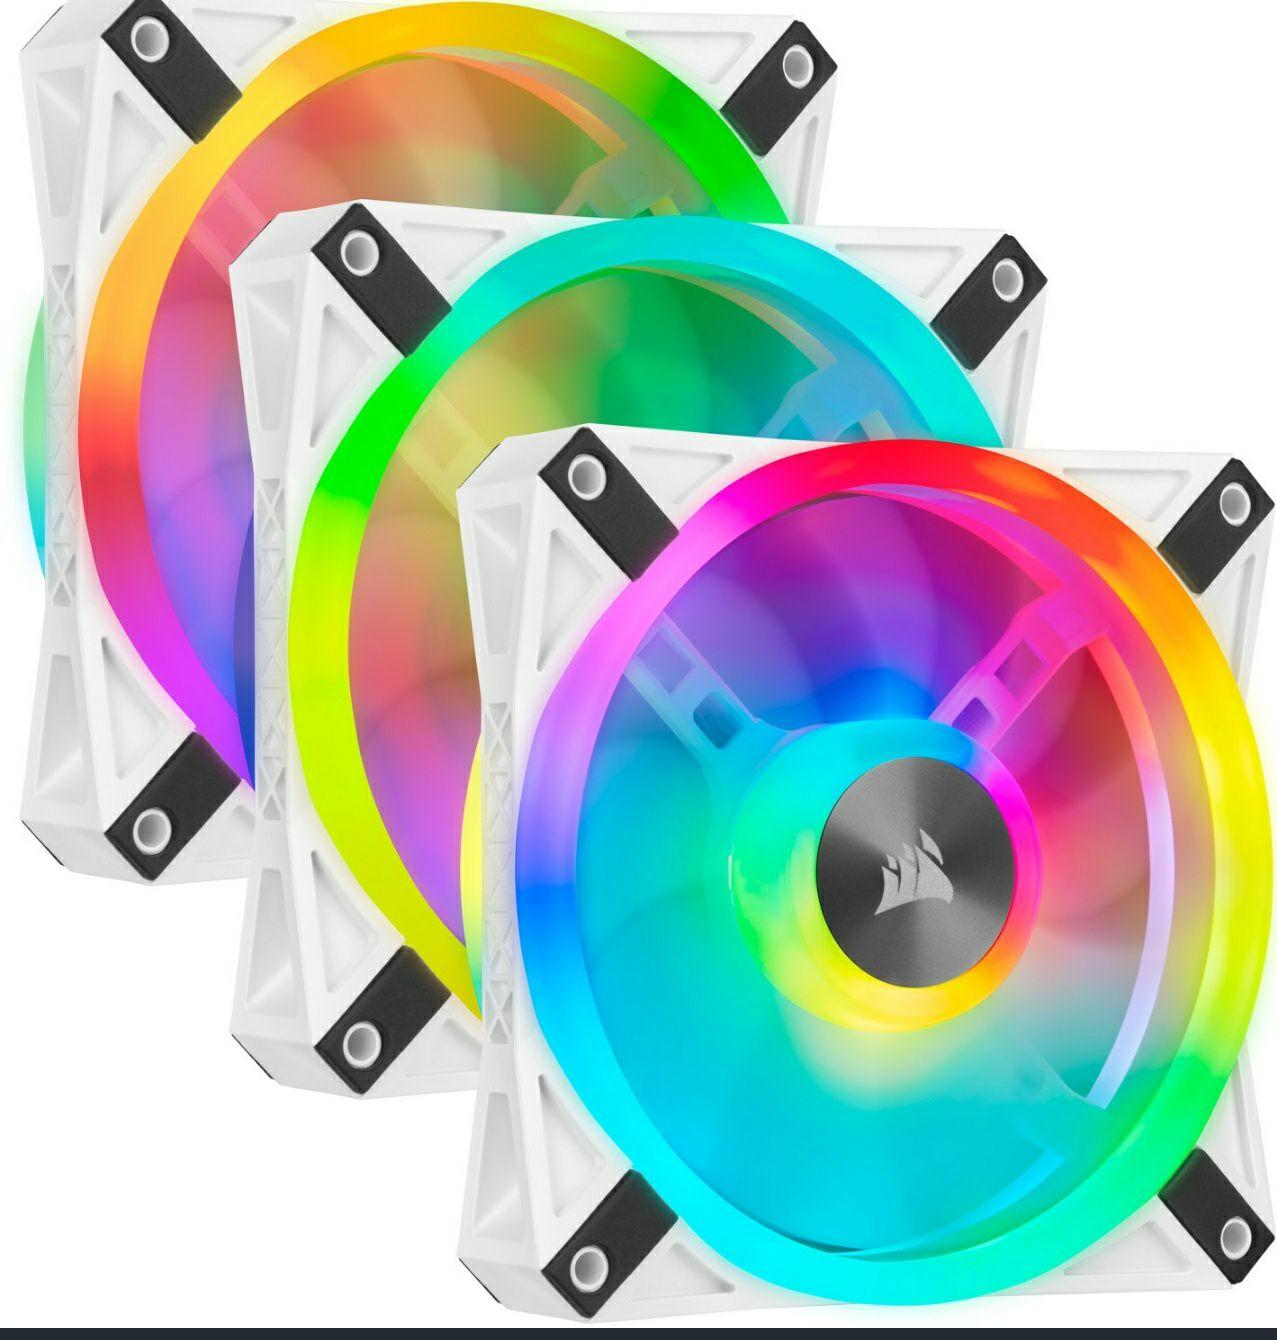 Corsair iCUE QL120 RGB 3er Pack